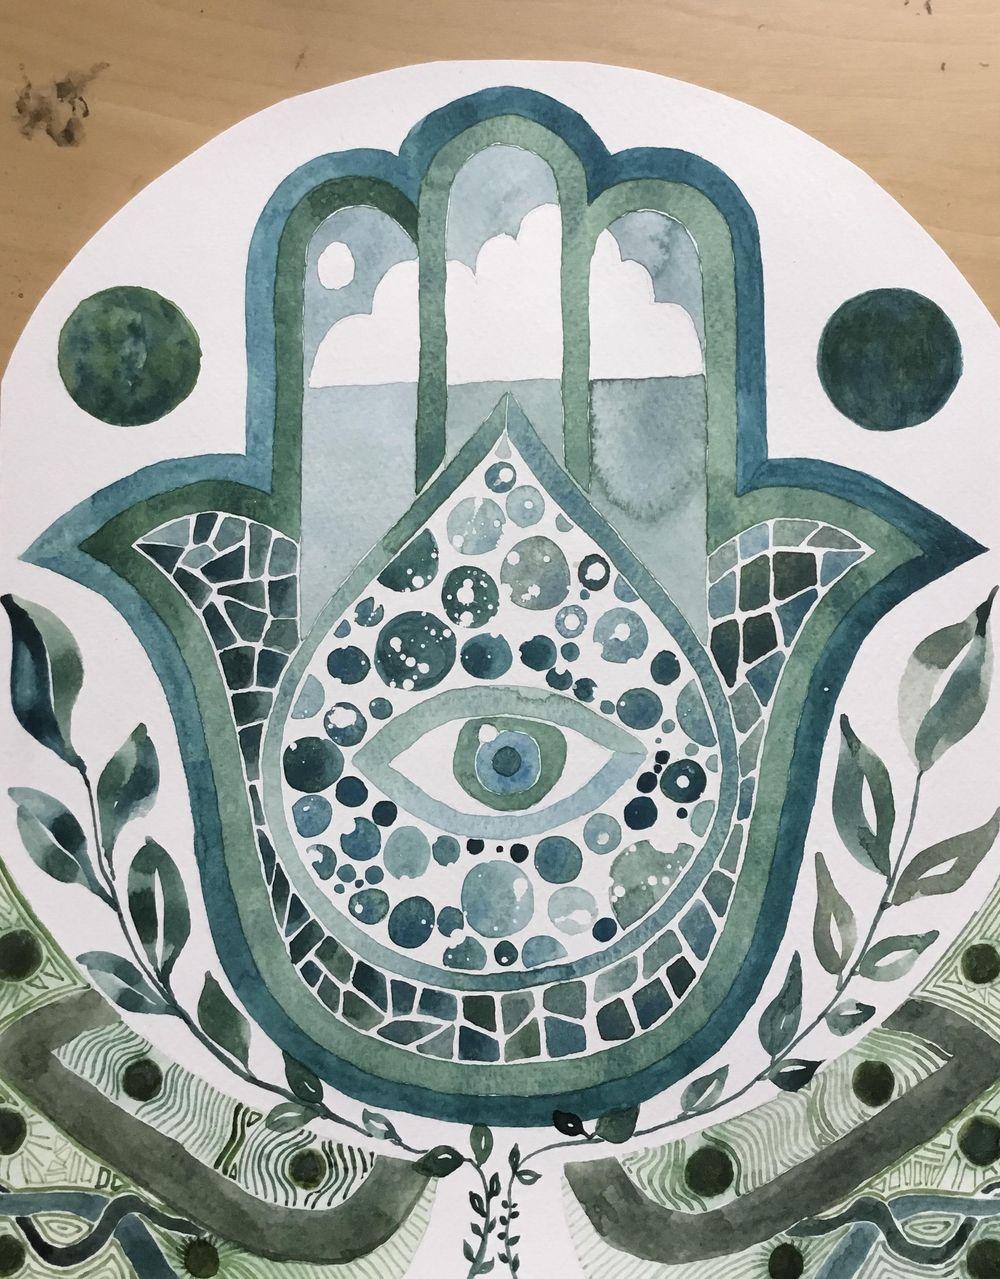 Monochrome-ish Hamsa Hand in Green-Blue - image 1 - student project